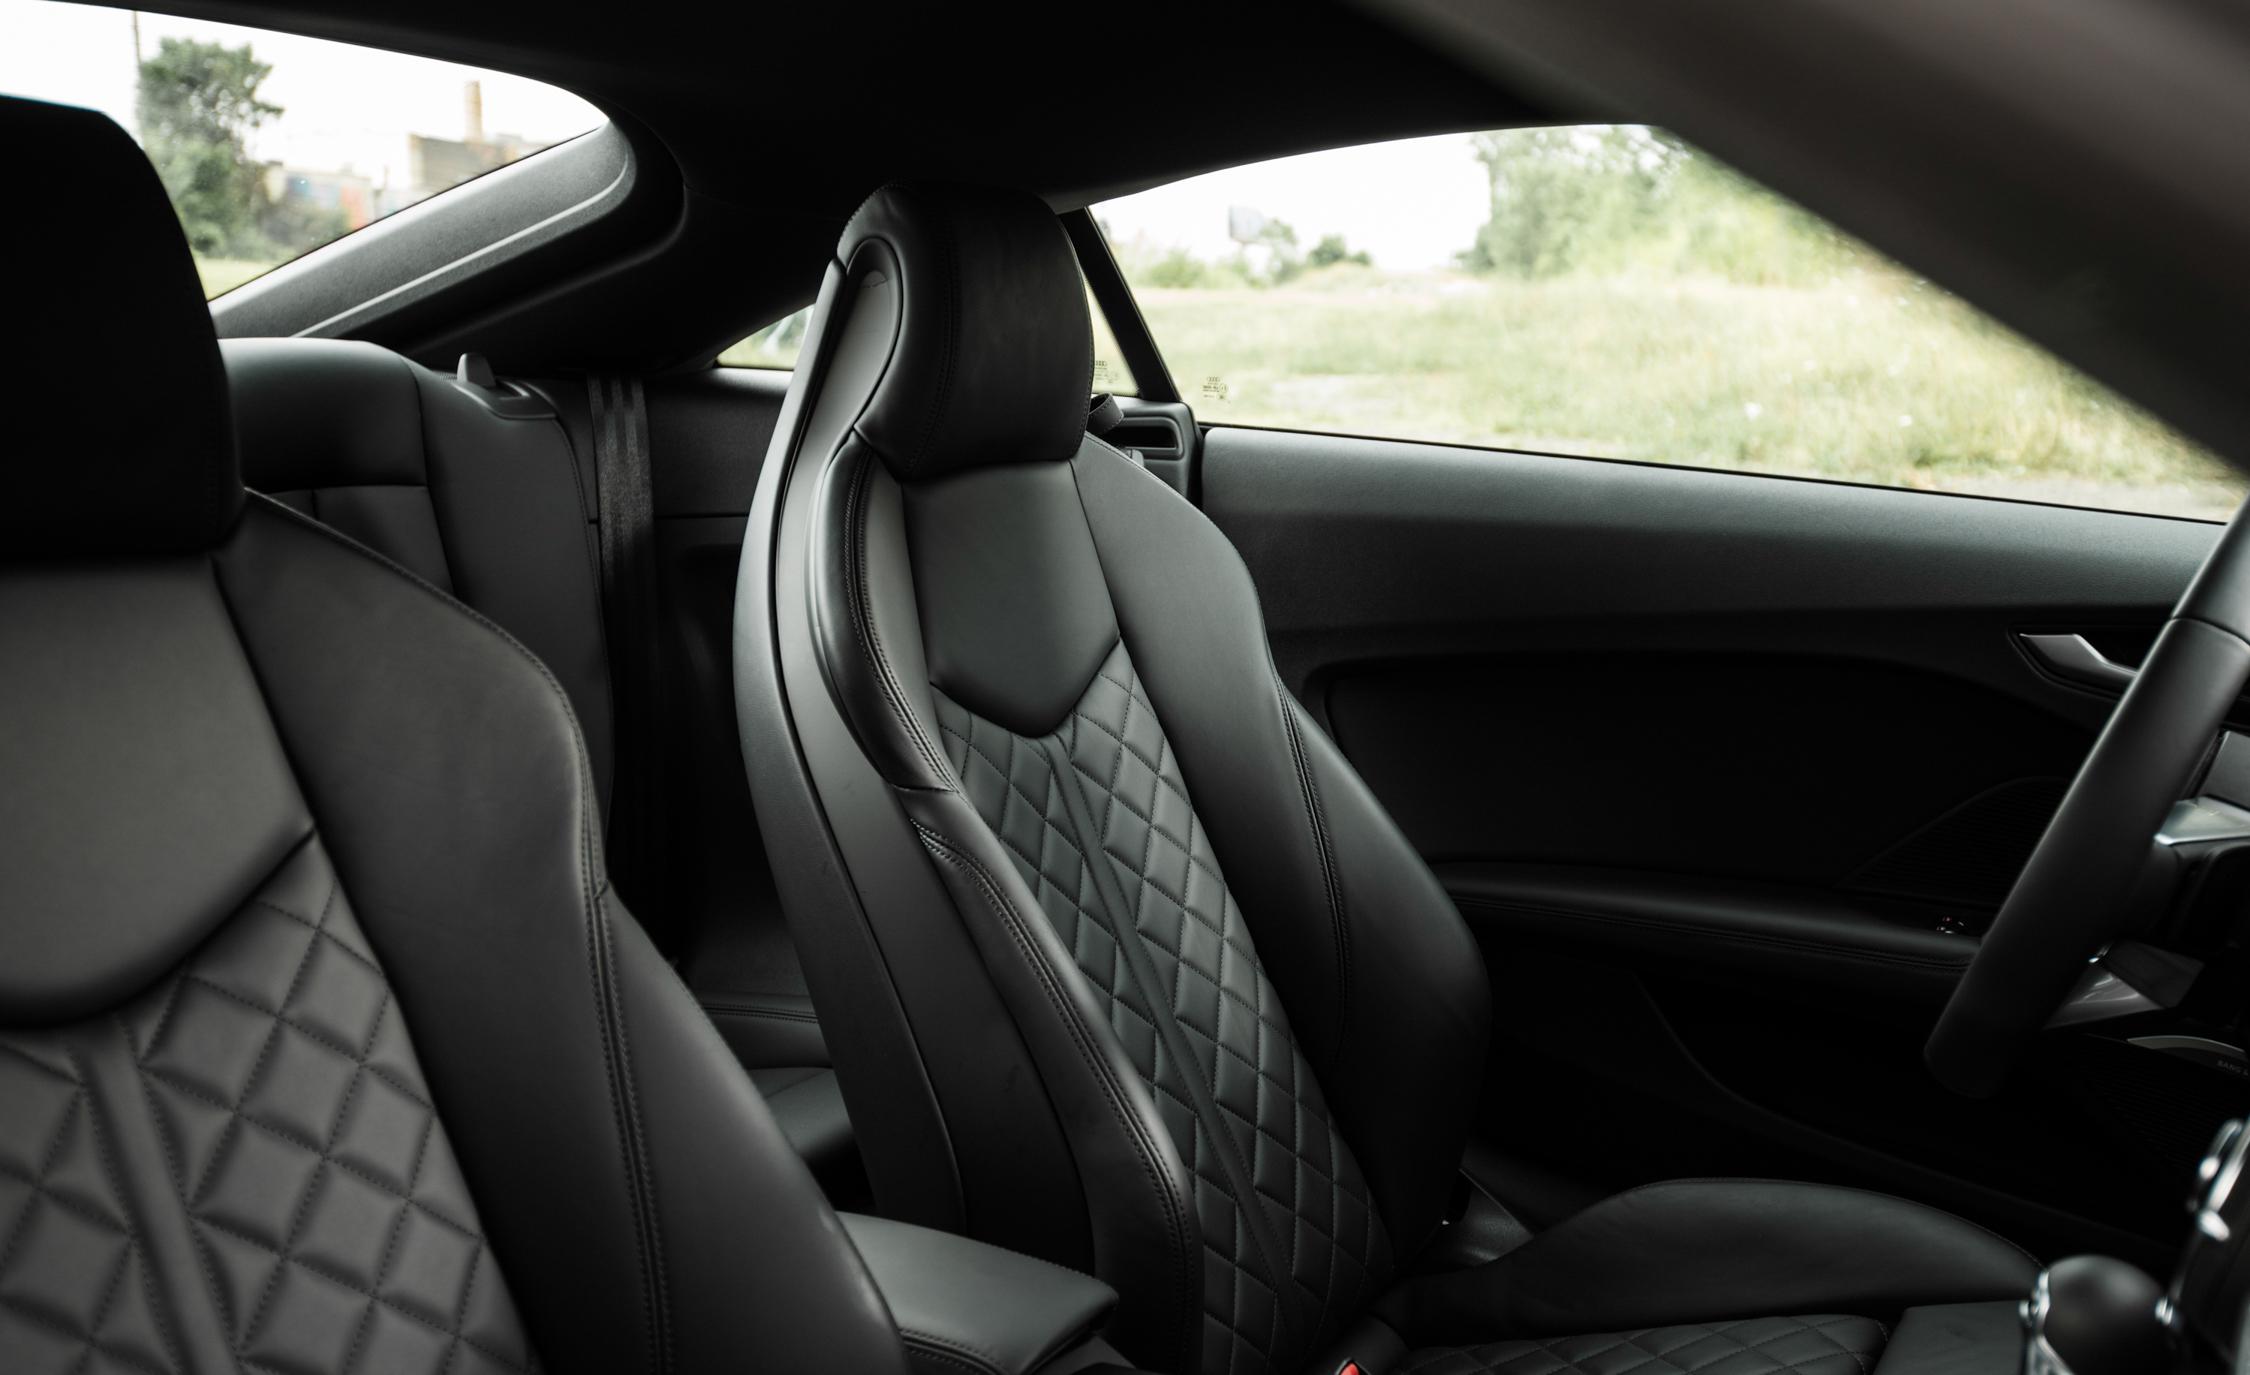 2016 Audi TT Coupe Interior Front Seats